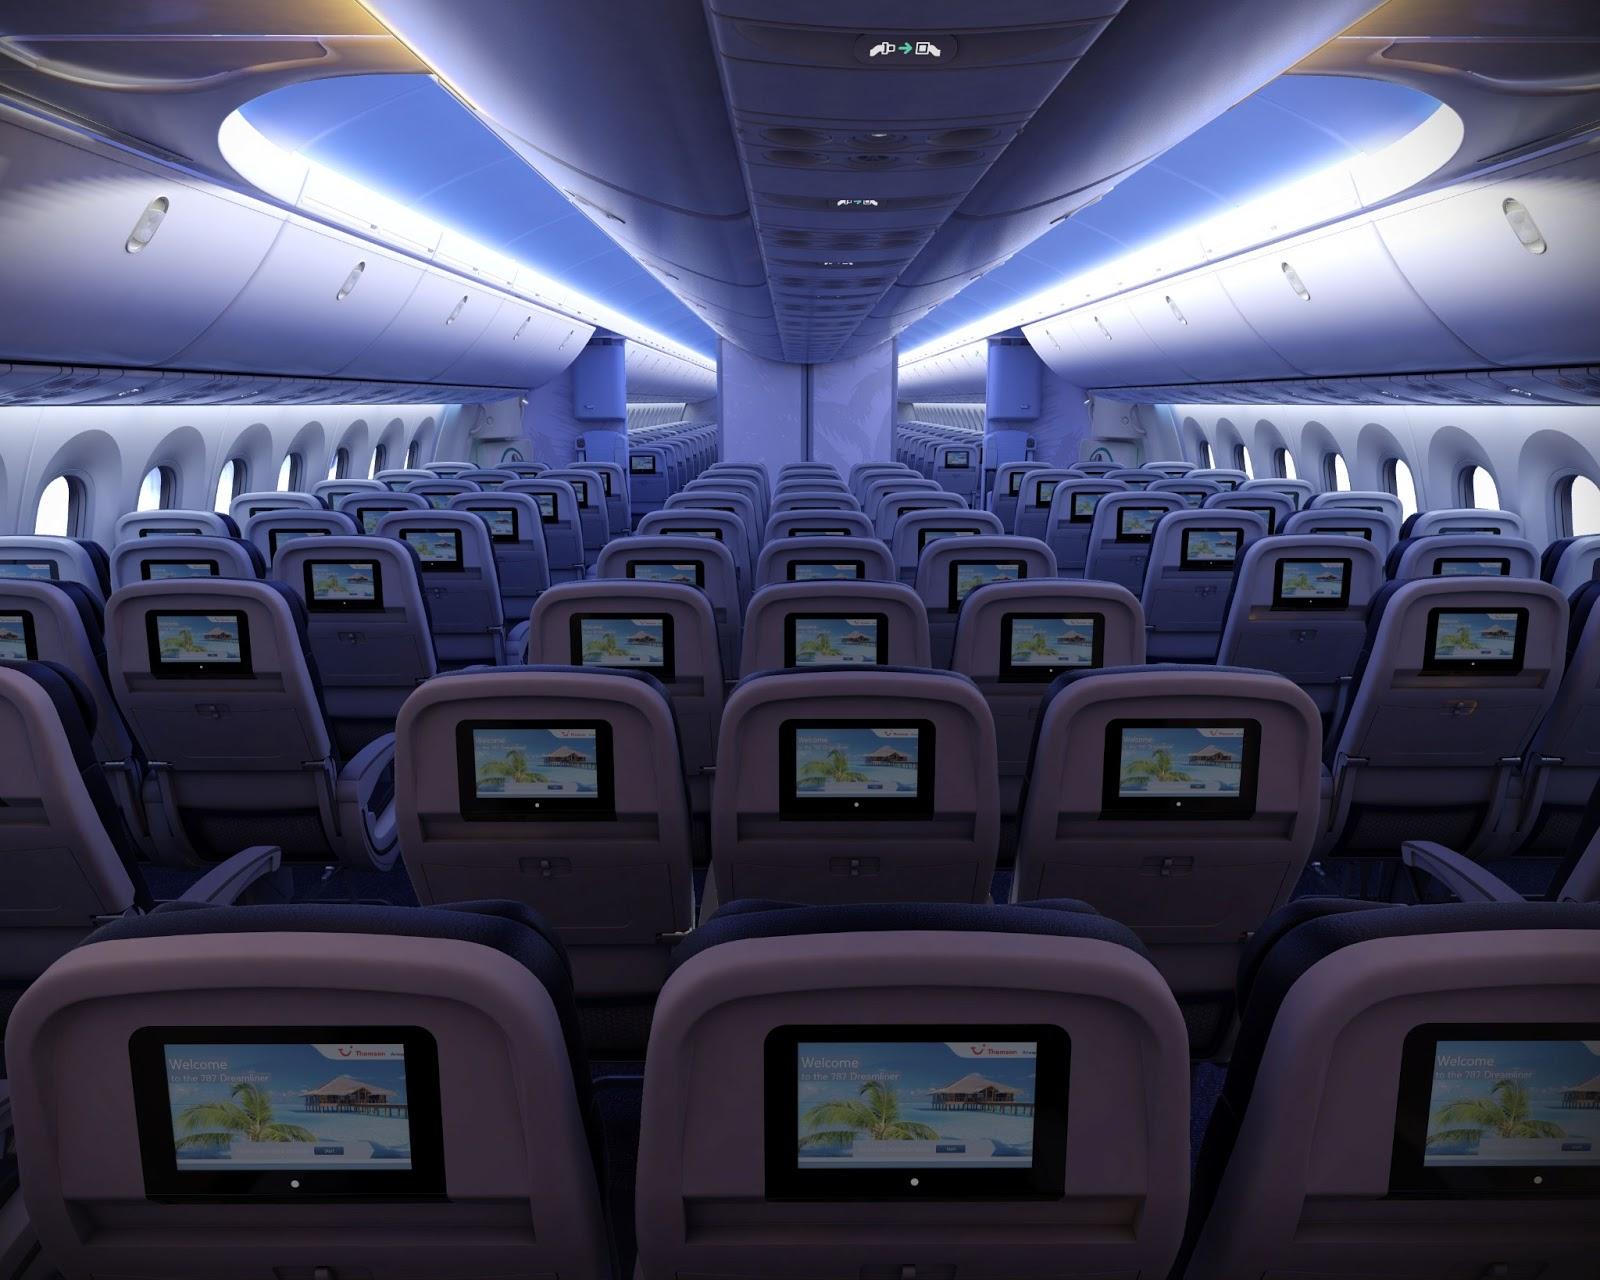 Салон Boeing 787 Dreamliner ночью